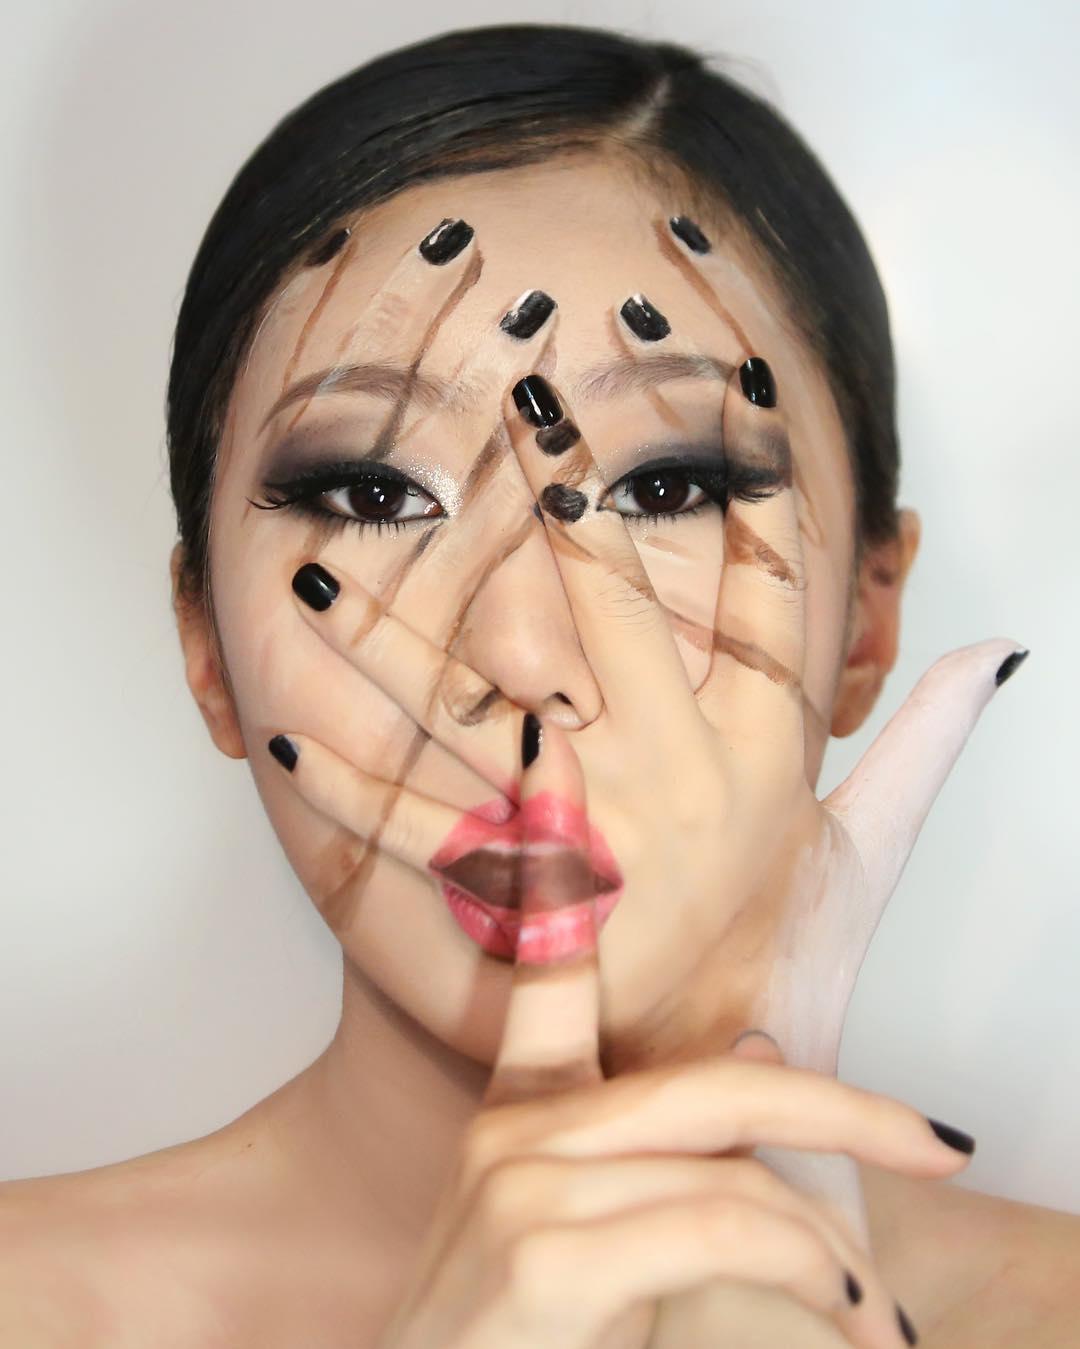 dain-yoon-art-2-1557519092064.jpg